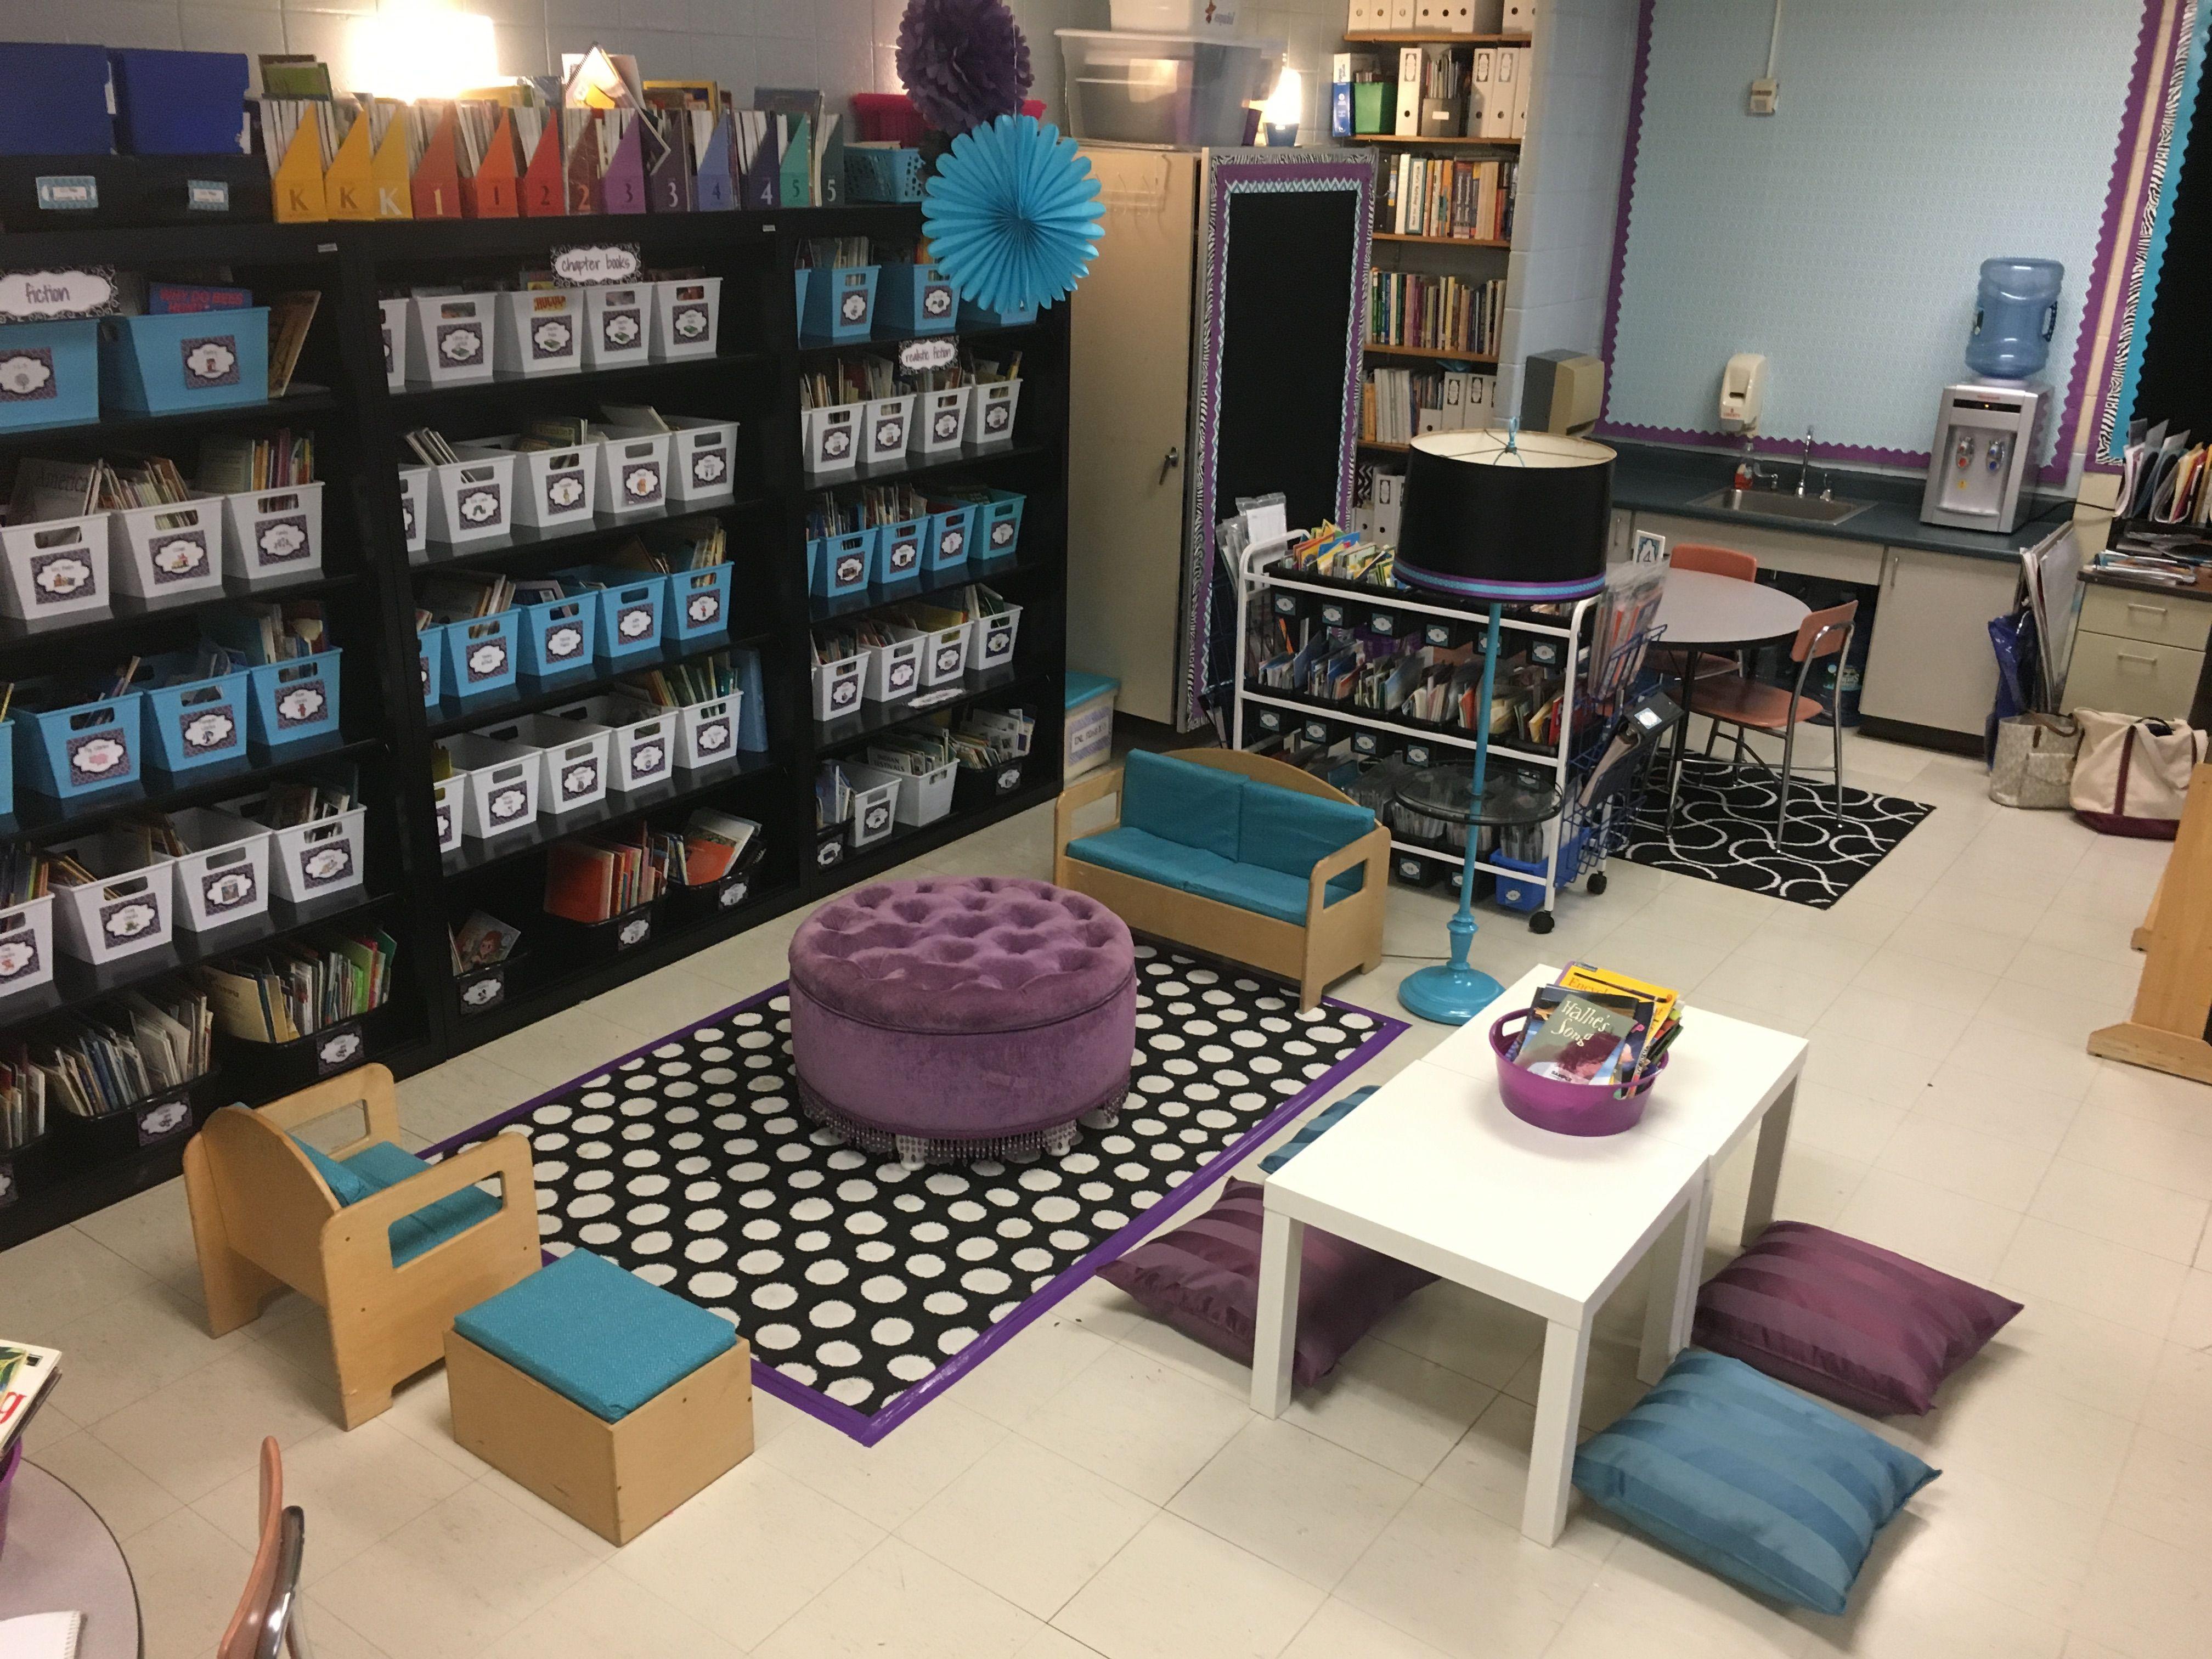 Relaxing Classroom Decor ~ Purple black teal class decor classroom library